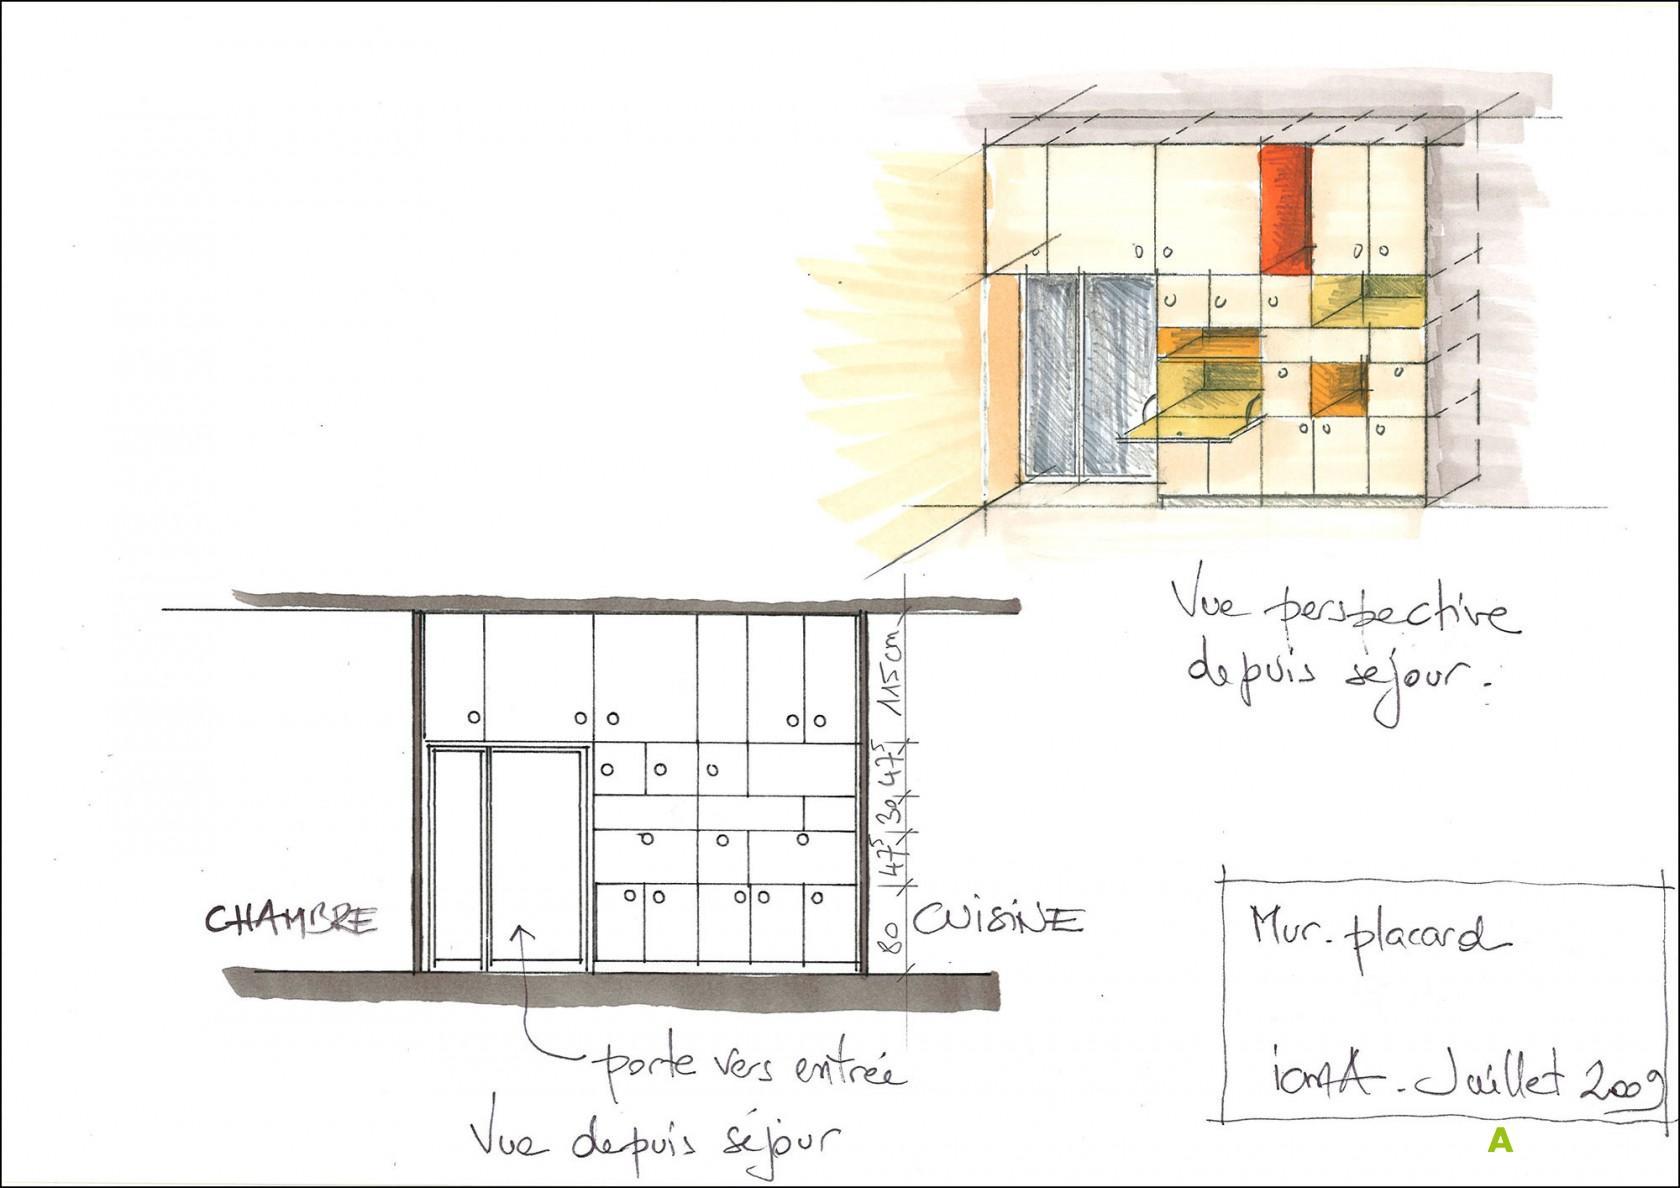 conception-mur-placard-15-07-09